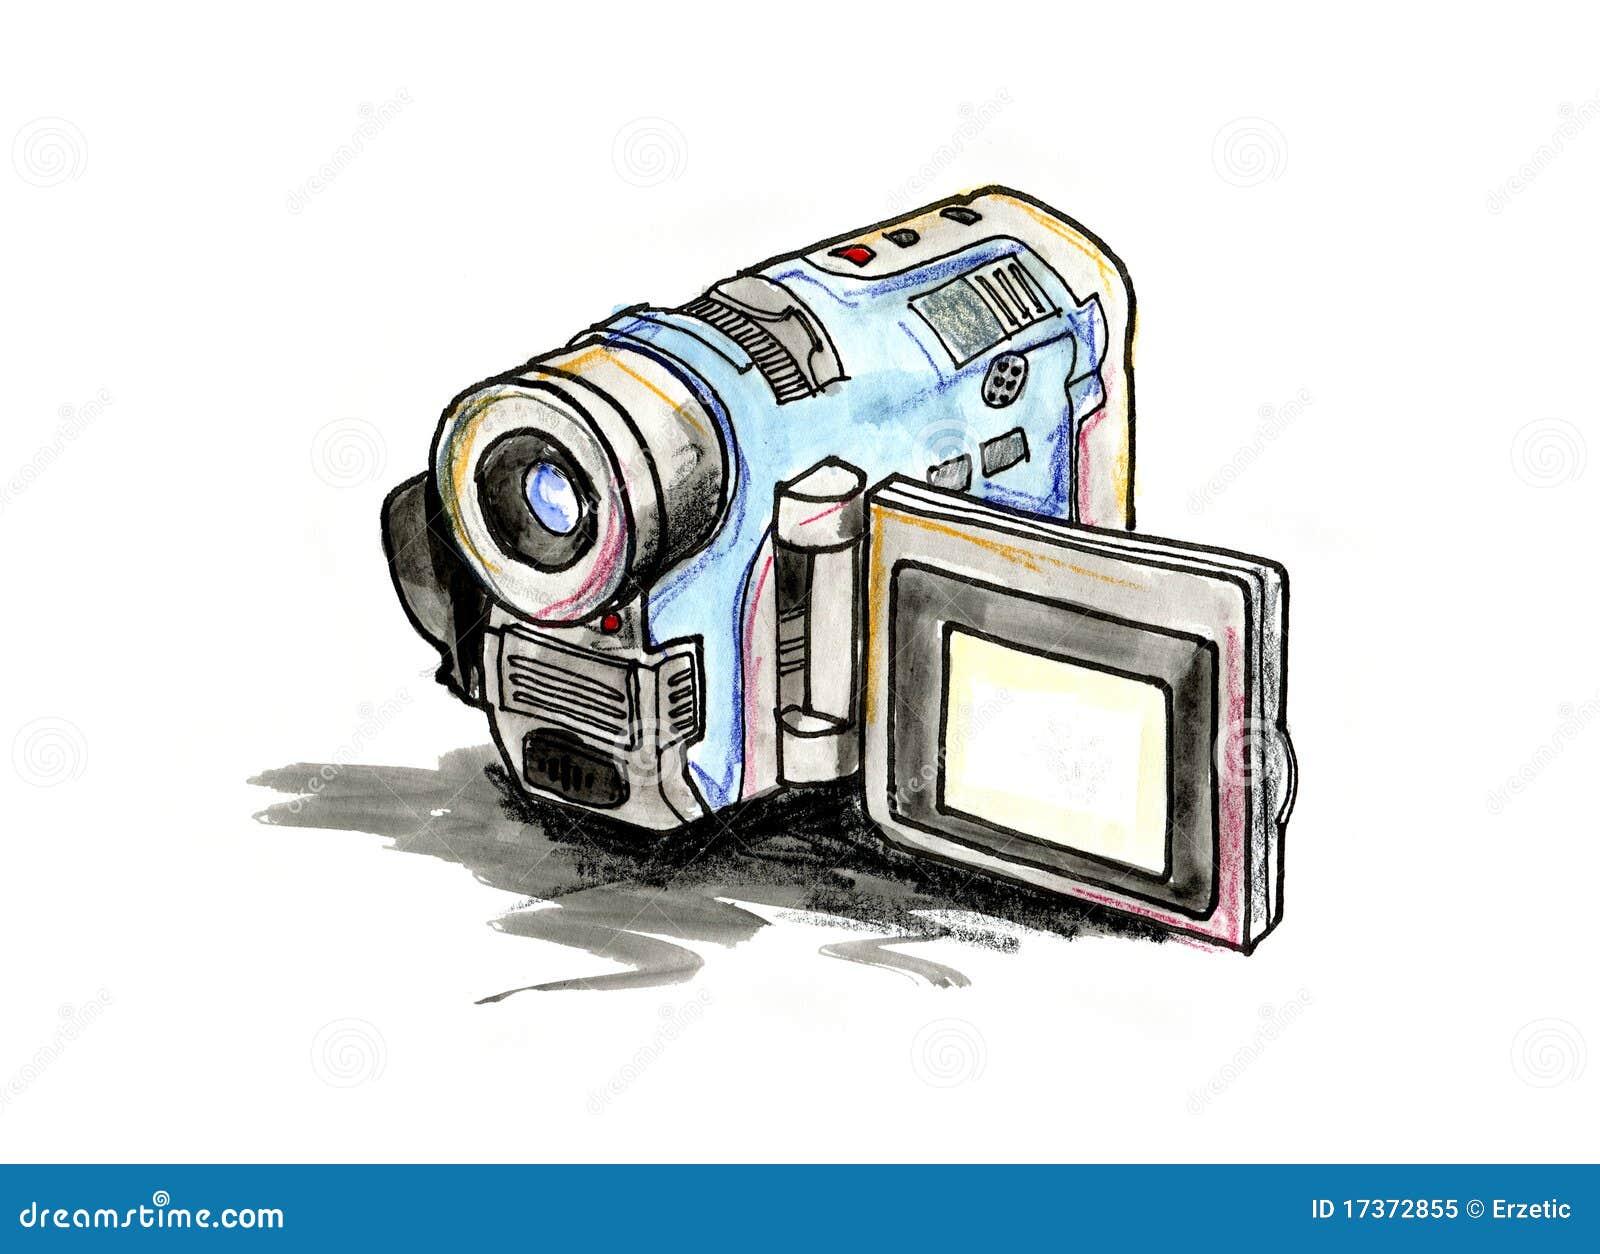 handliche videokamera lizenzfreies stockfoto bild 17372855. Black Bedroom Furniture Sets. Home Design Ideas